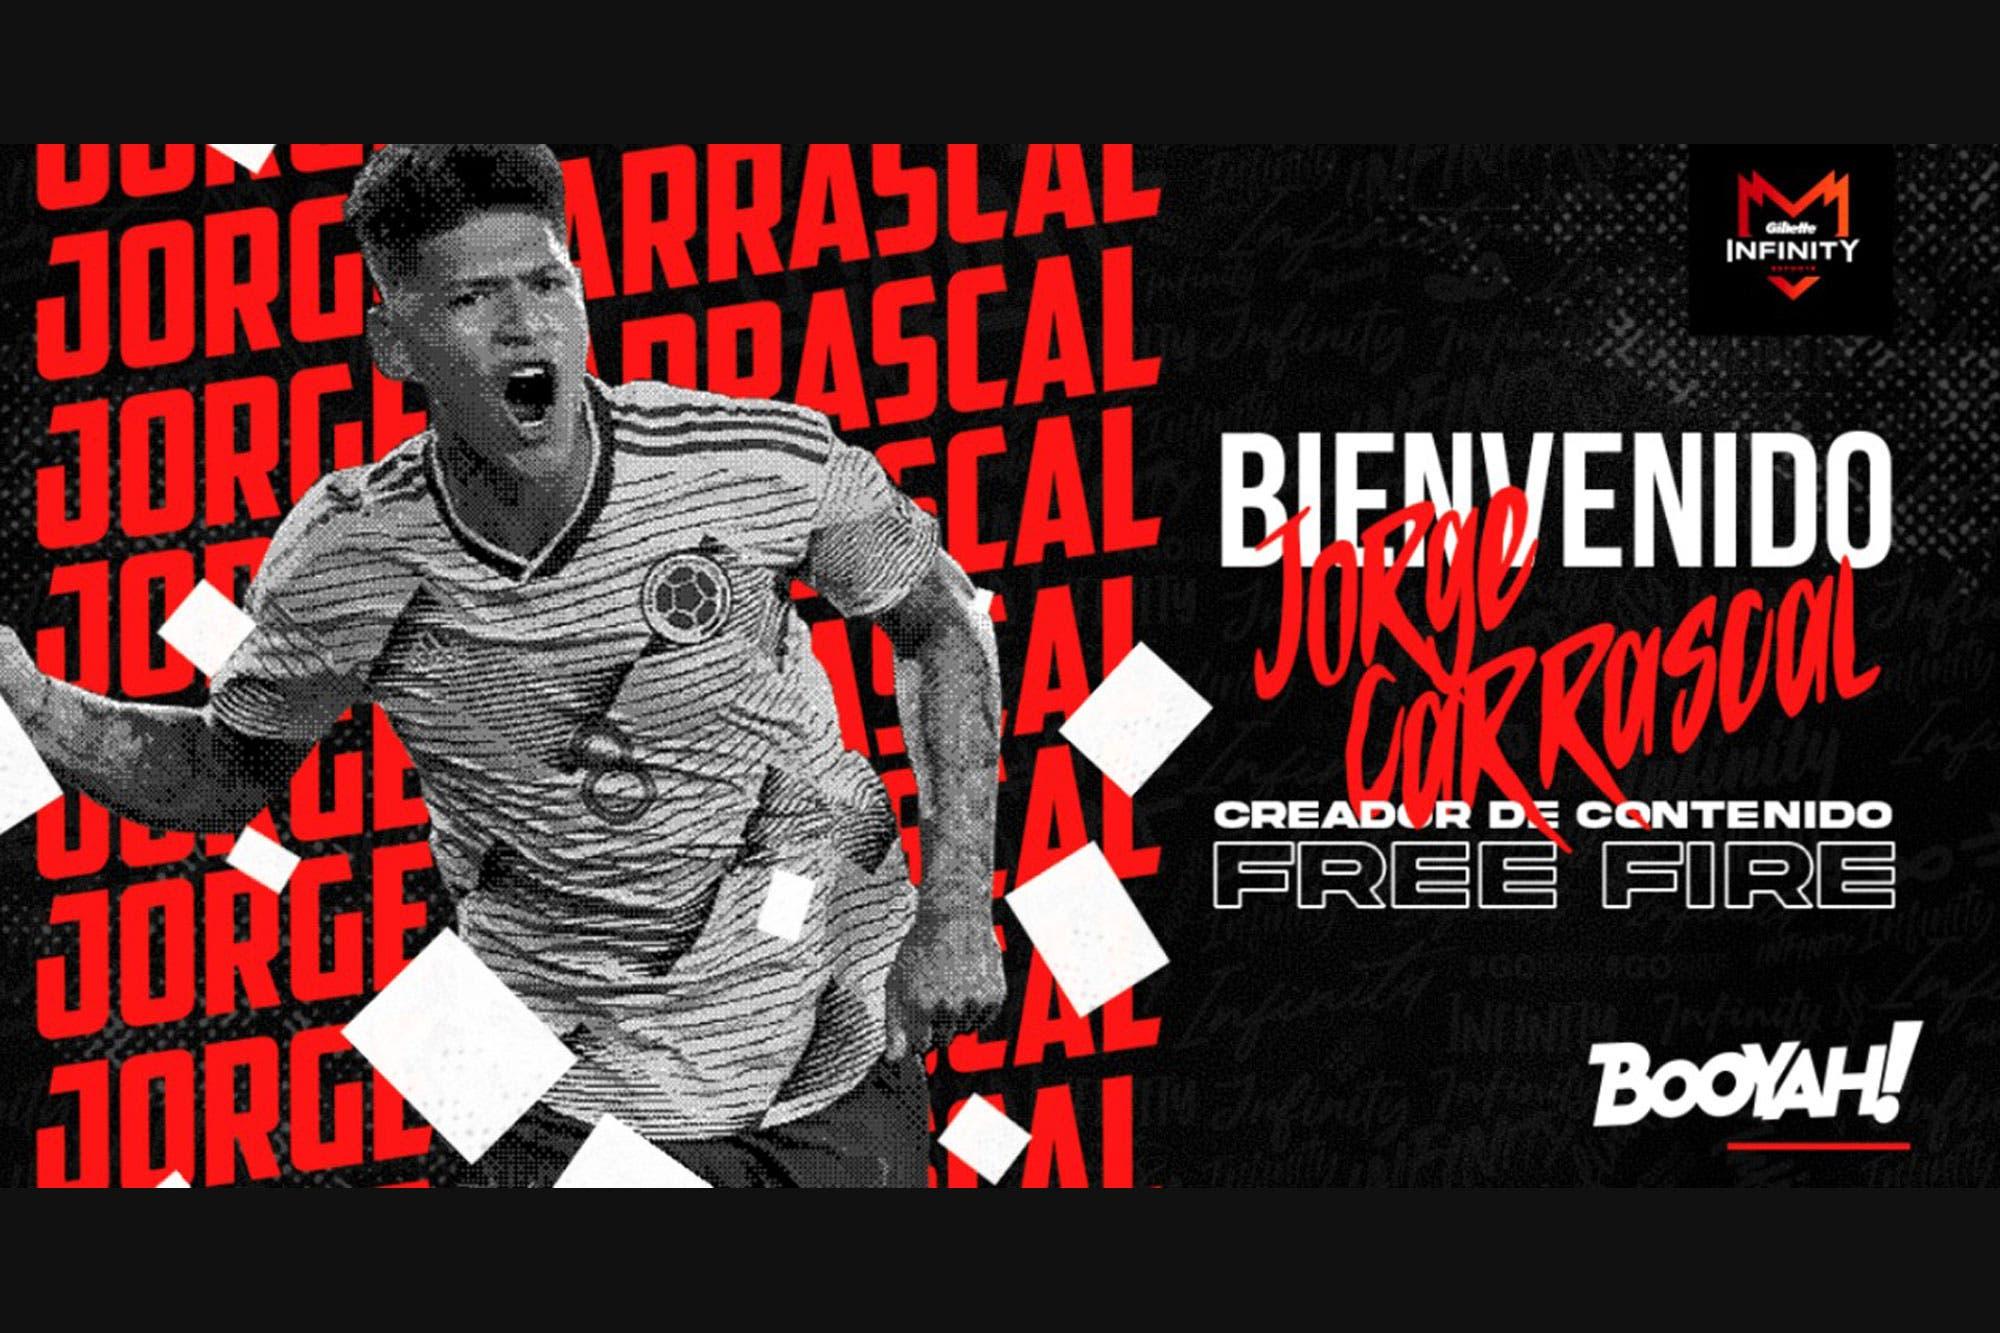 De futbolista a gamer: el jugador Jorge Carrascal de River Plate se convierte en streamer del videojuego Free Fire